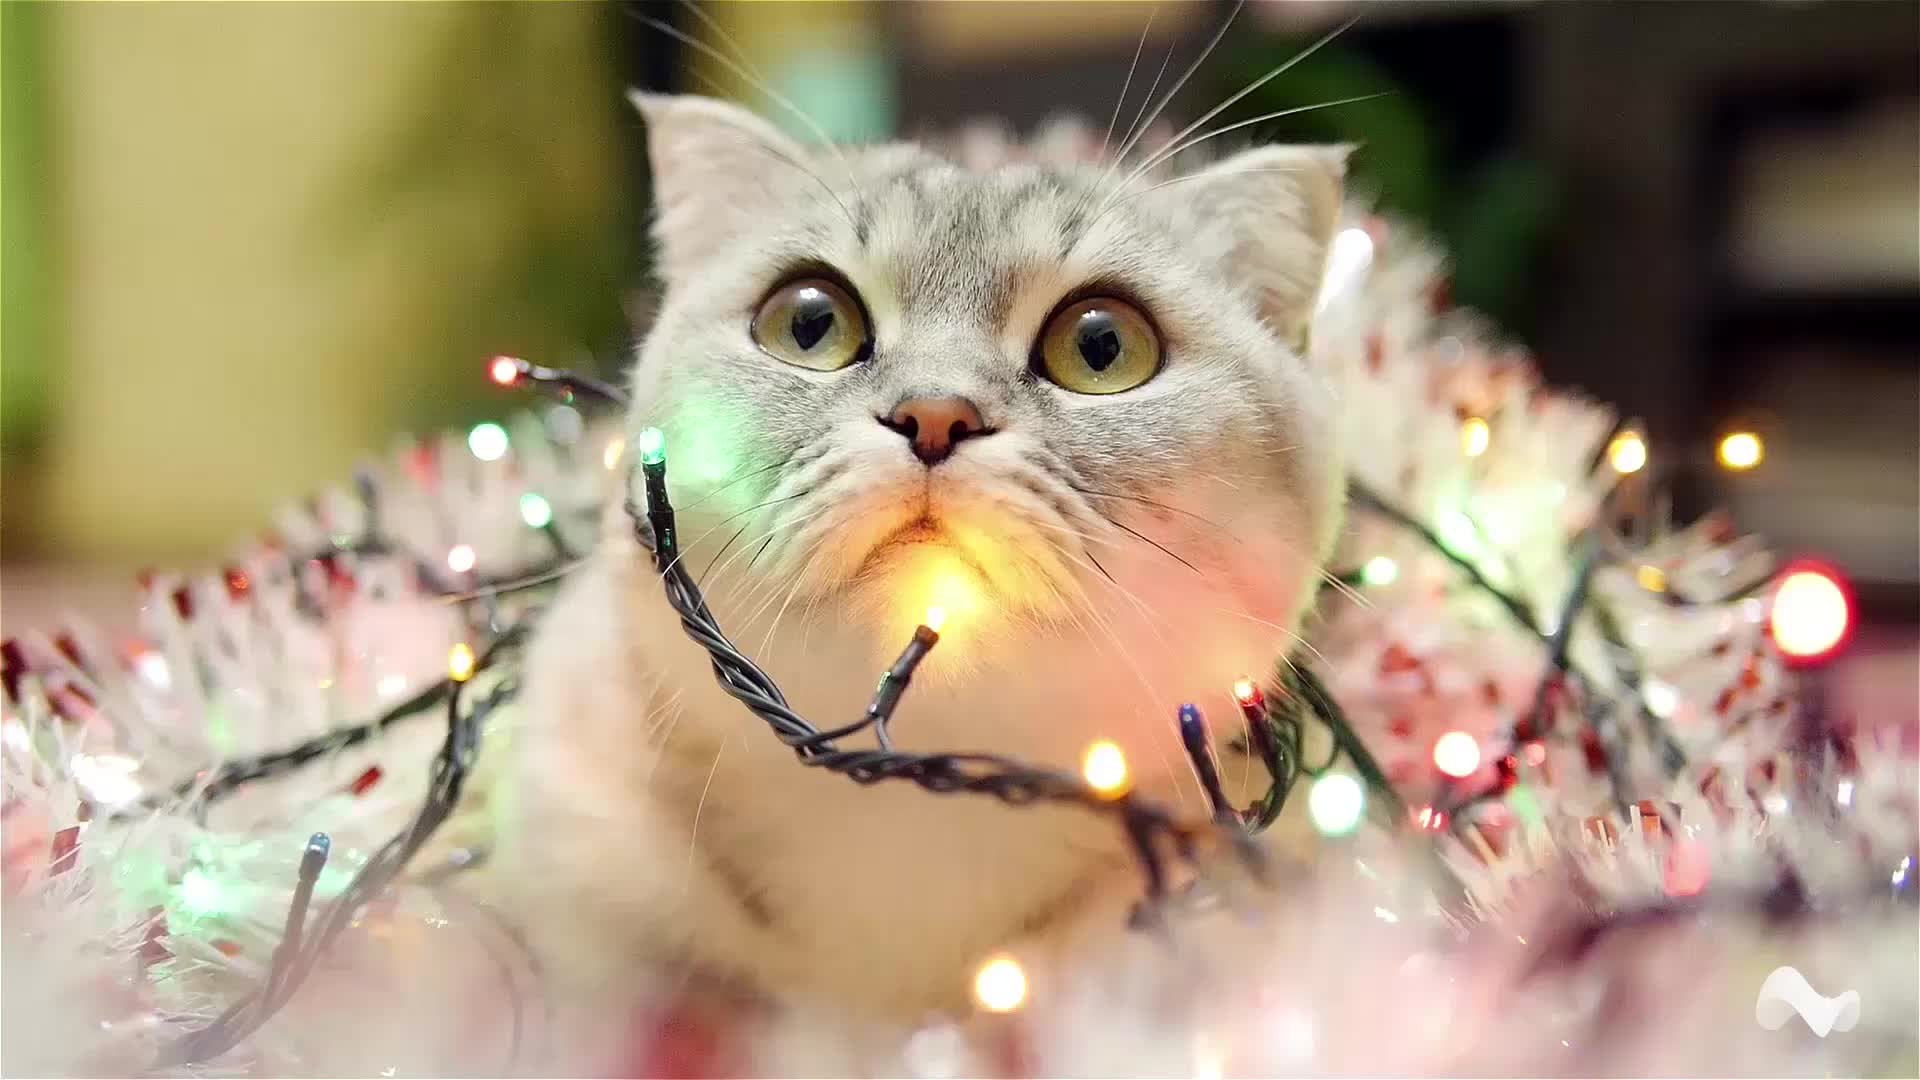 CatGifs, cat, catgifs, christmas, cute, kitten, kitty, xmas, Scottish Fold Xmas Lights GIFs